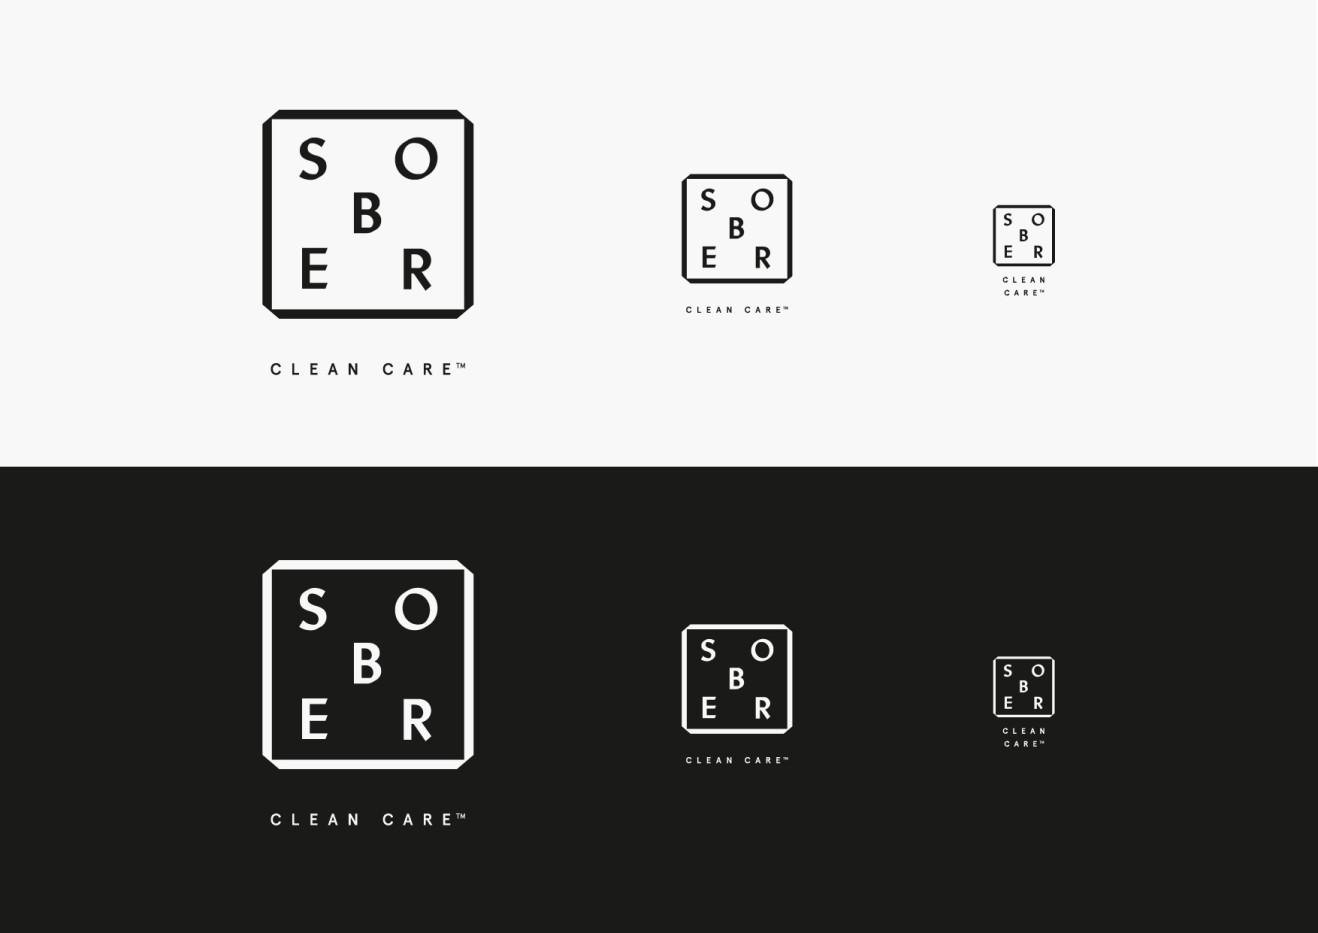 Sober_Logo_Web-01